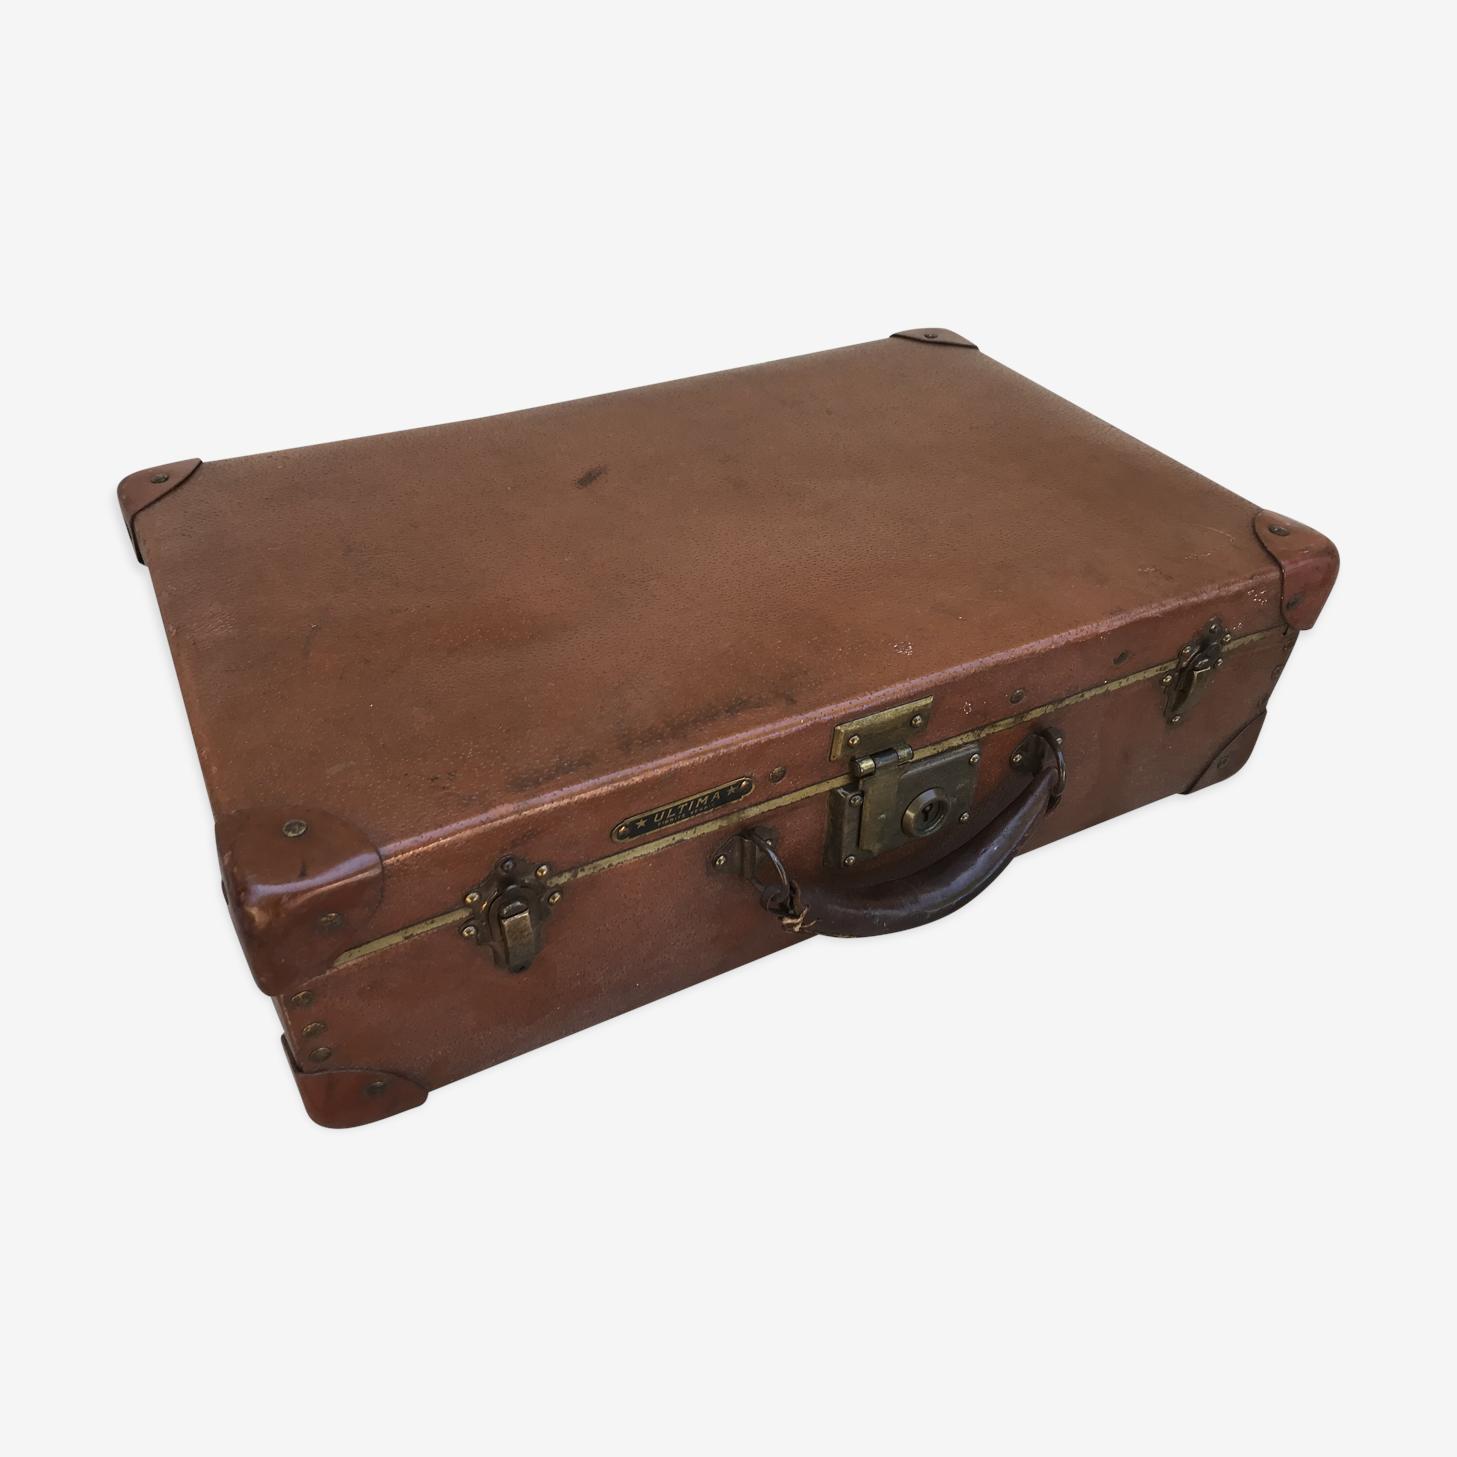 Old suitcase travel ultima brown fiber trunk